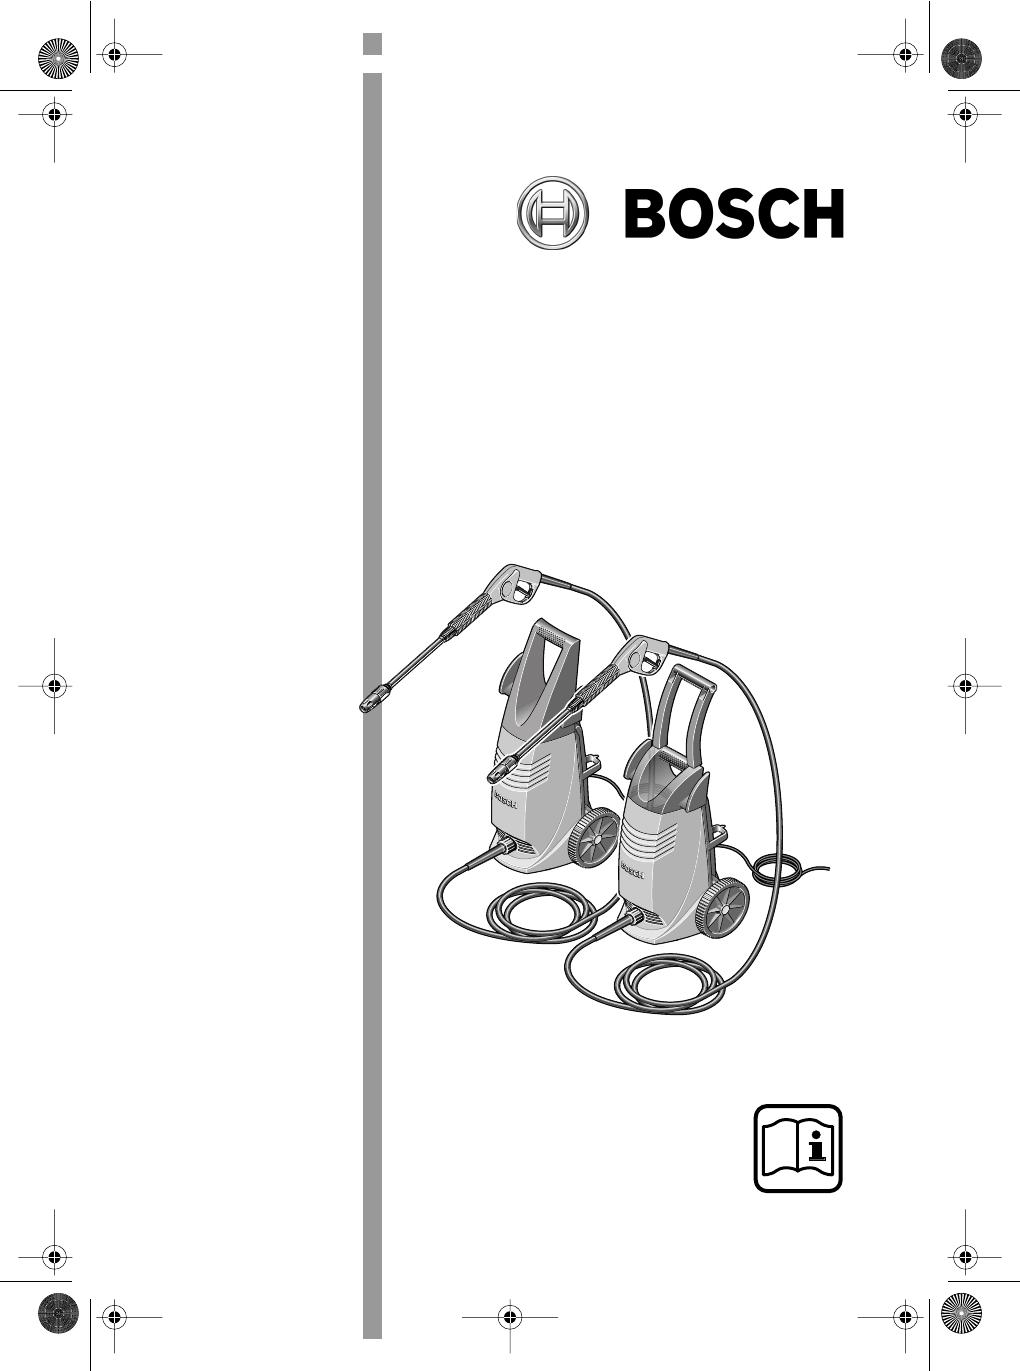 Handleiding Bosch Aquatak 1200 Plus Power (pagina 1 van 97